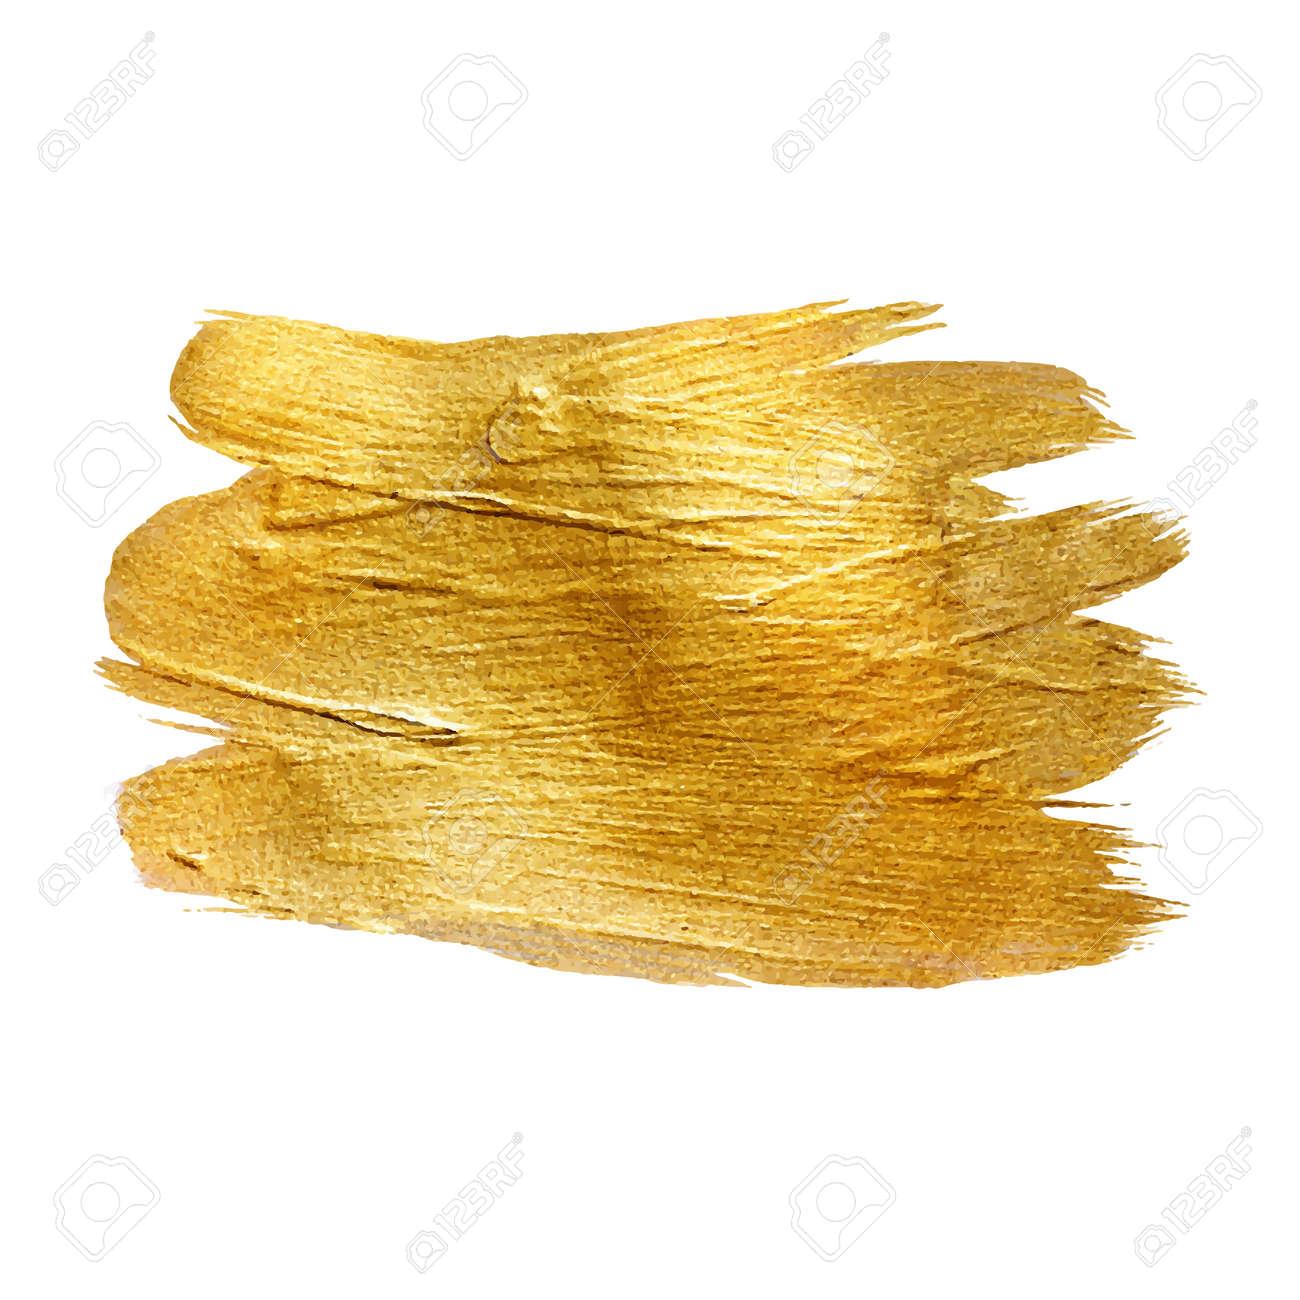 Gold Metal Foil Glitter Brush Stroke. Golden Stroke Vector Design Illustration. Foil Shiny template. Pearl Gloss Design. Watercolor Metallic Paint Texture - 54827170